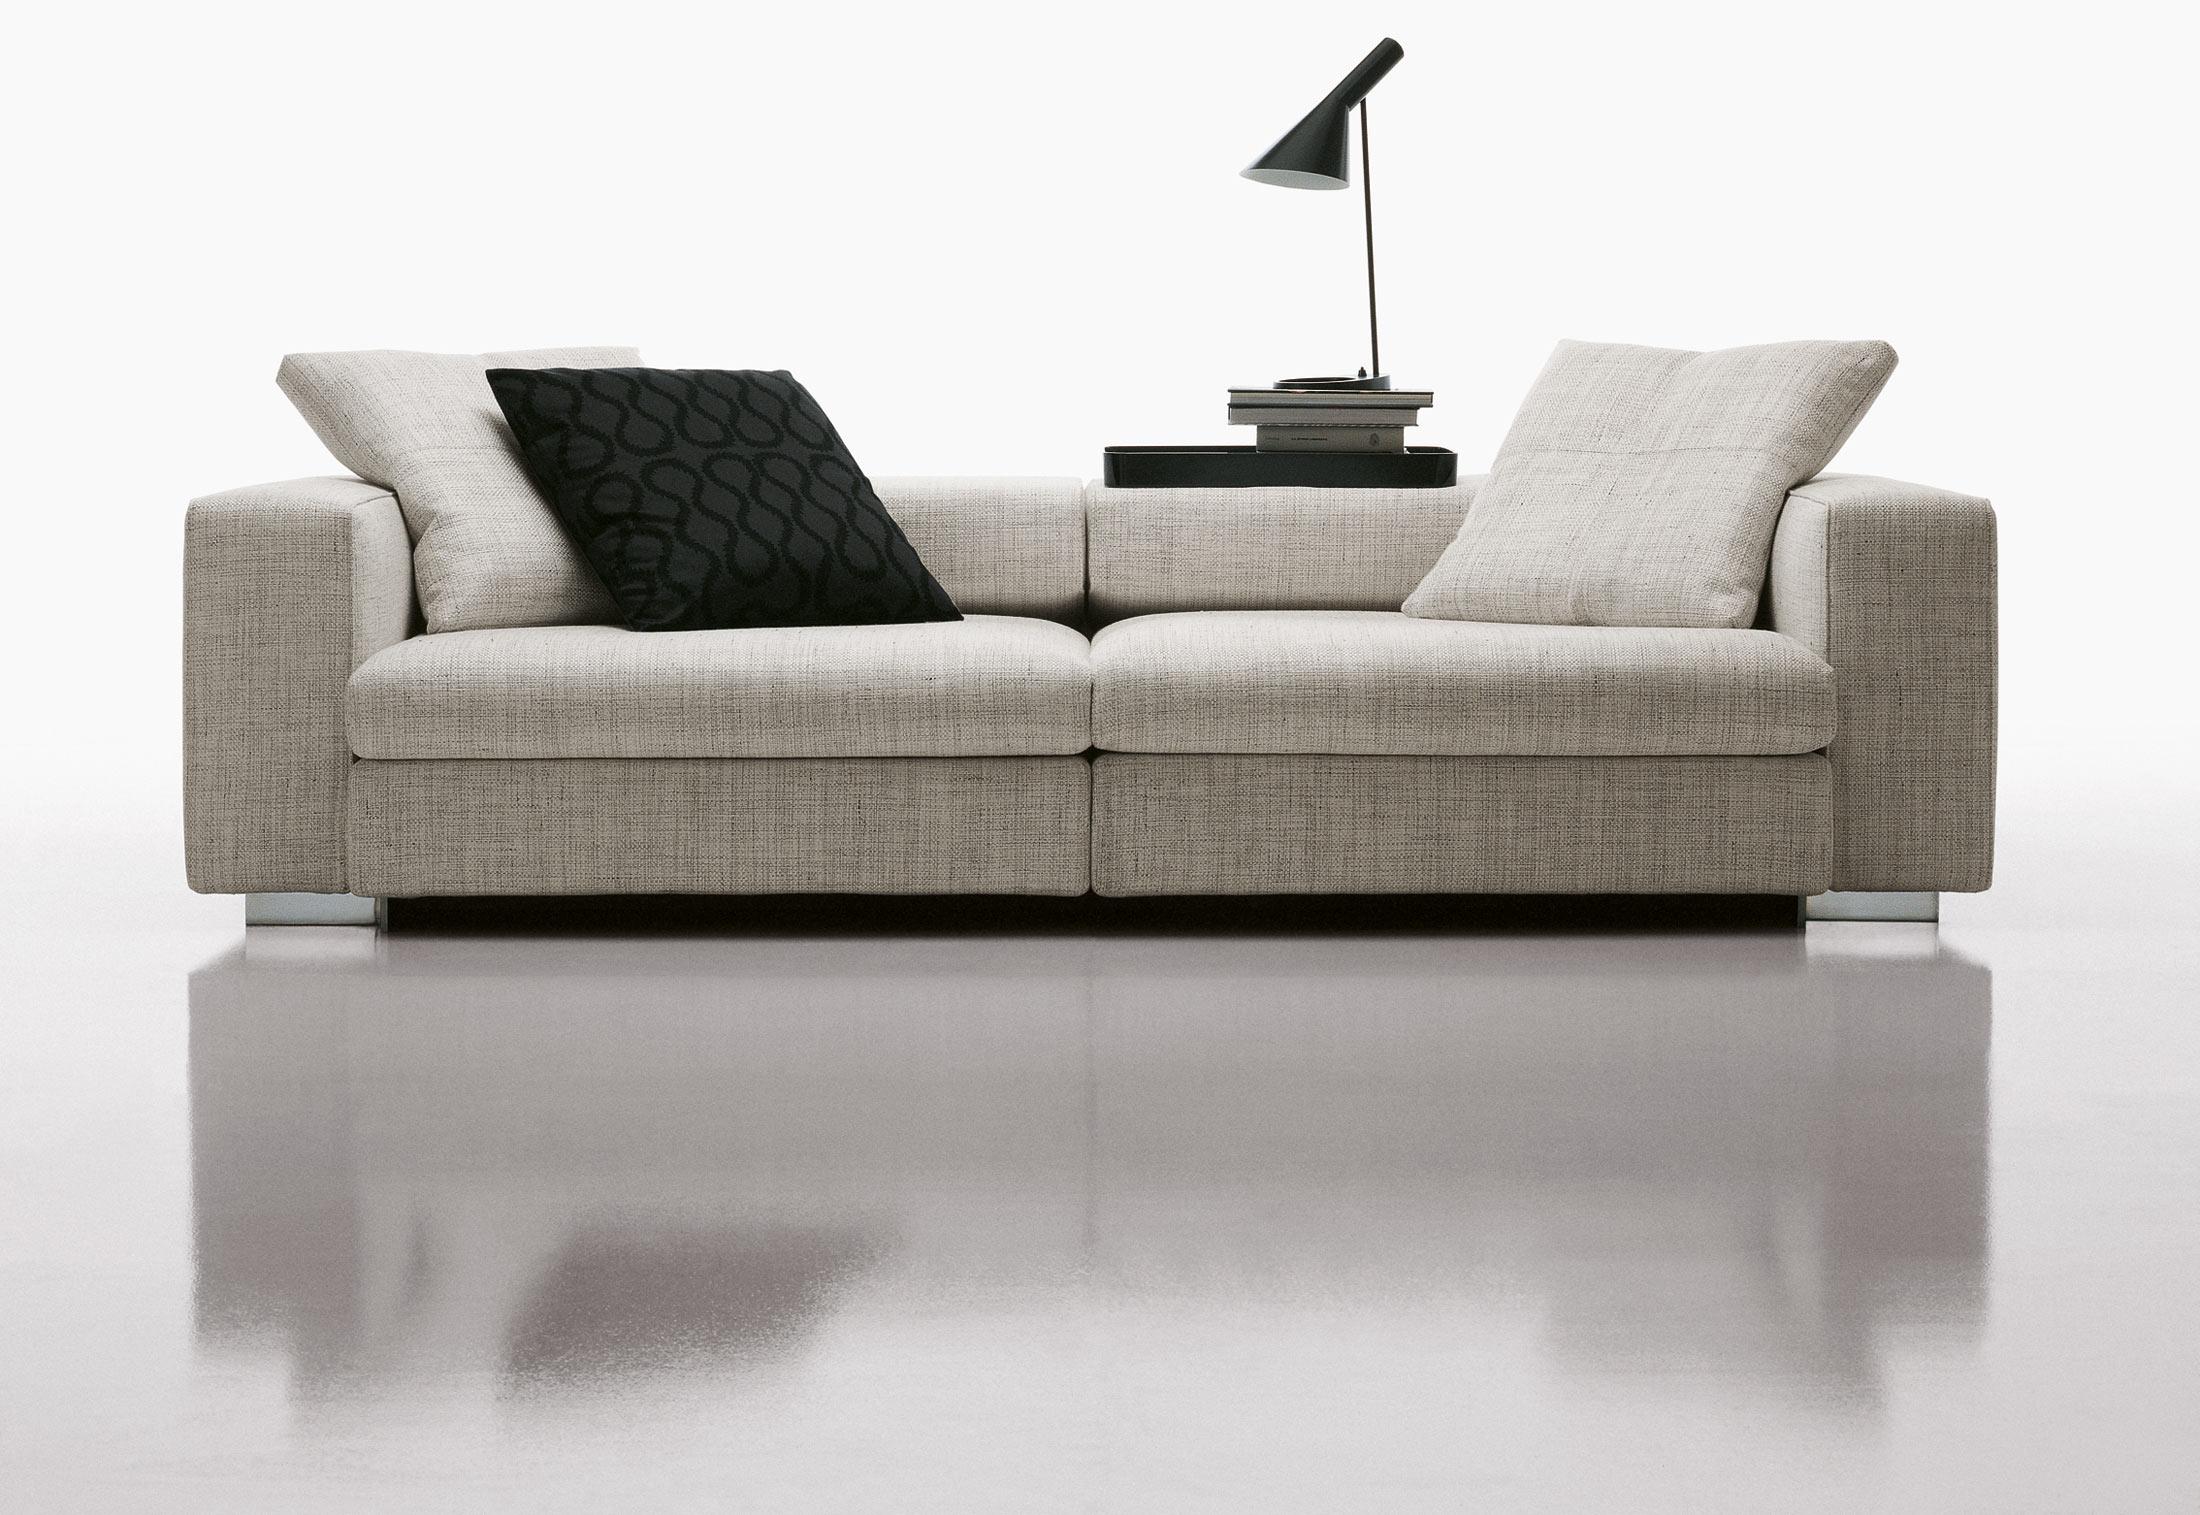 turner von molteni c stylepark. Black Bedroom Furniture Sets. Home Design Ideas